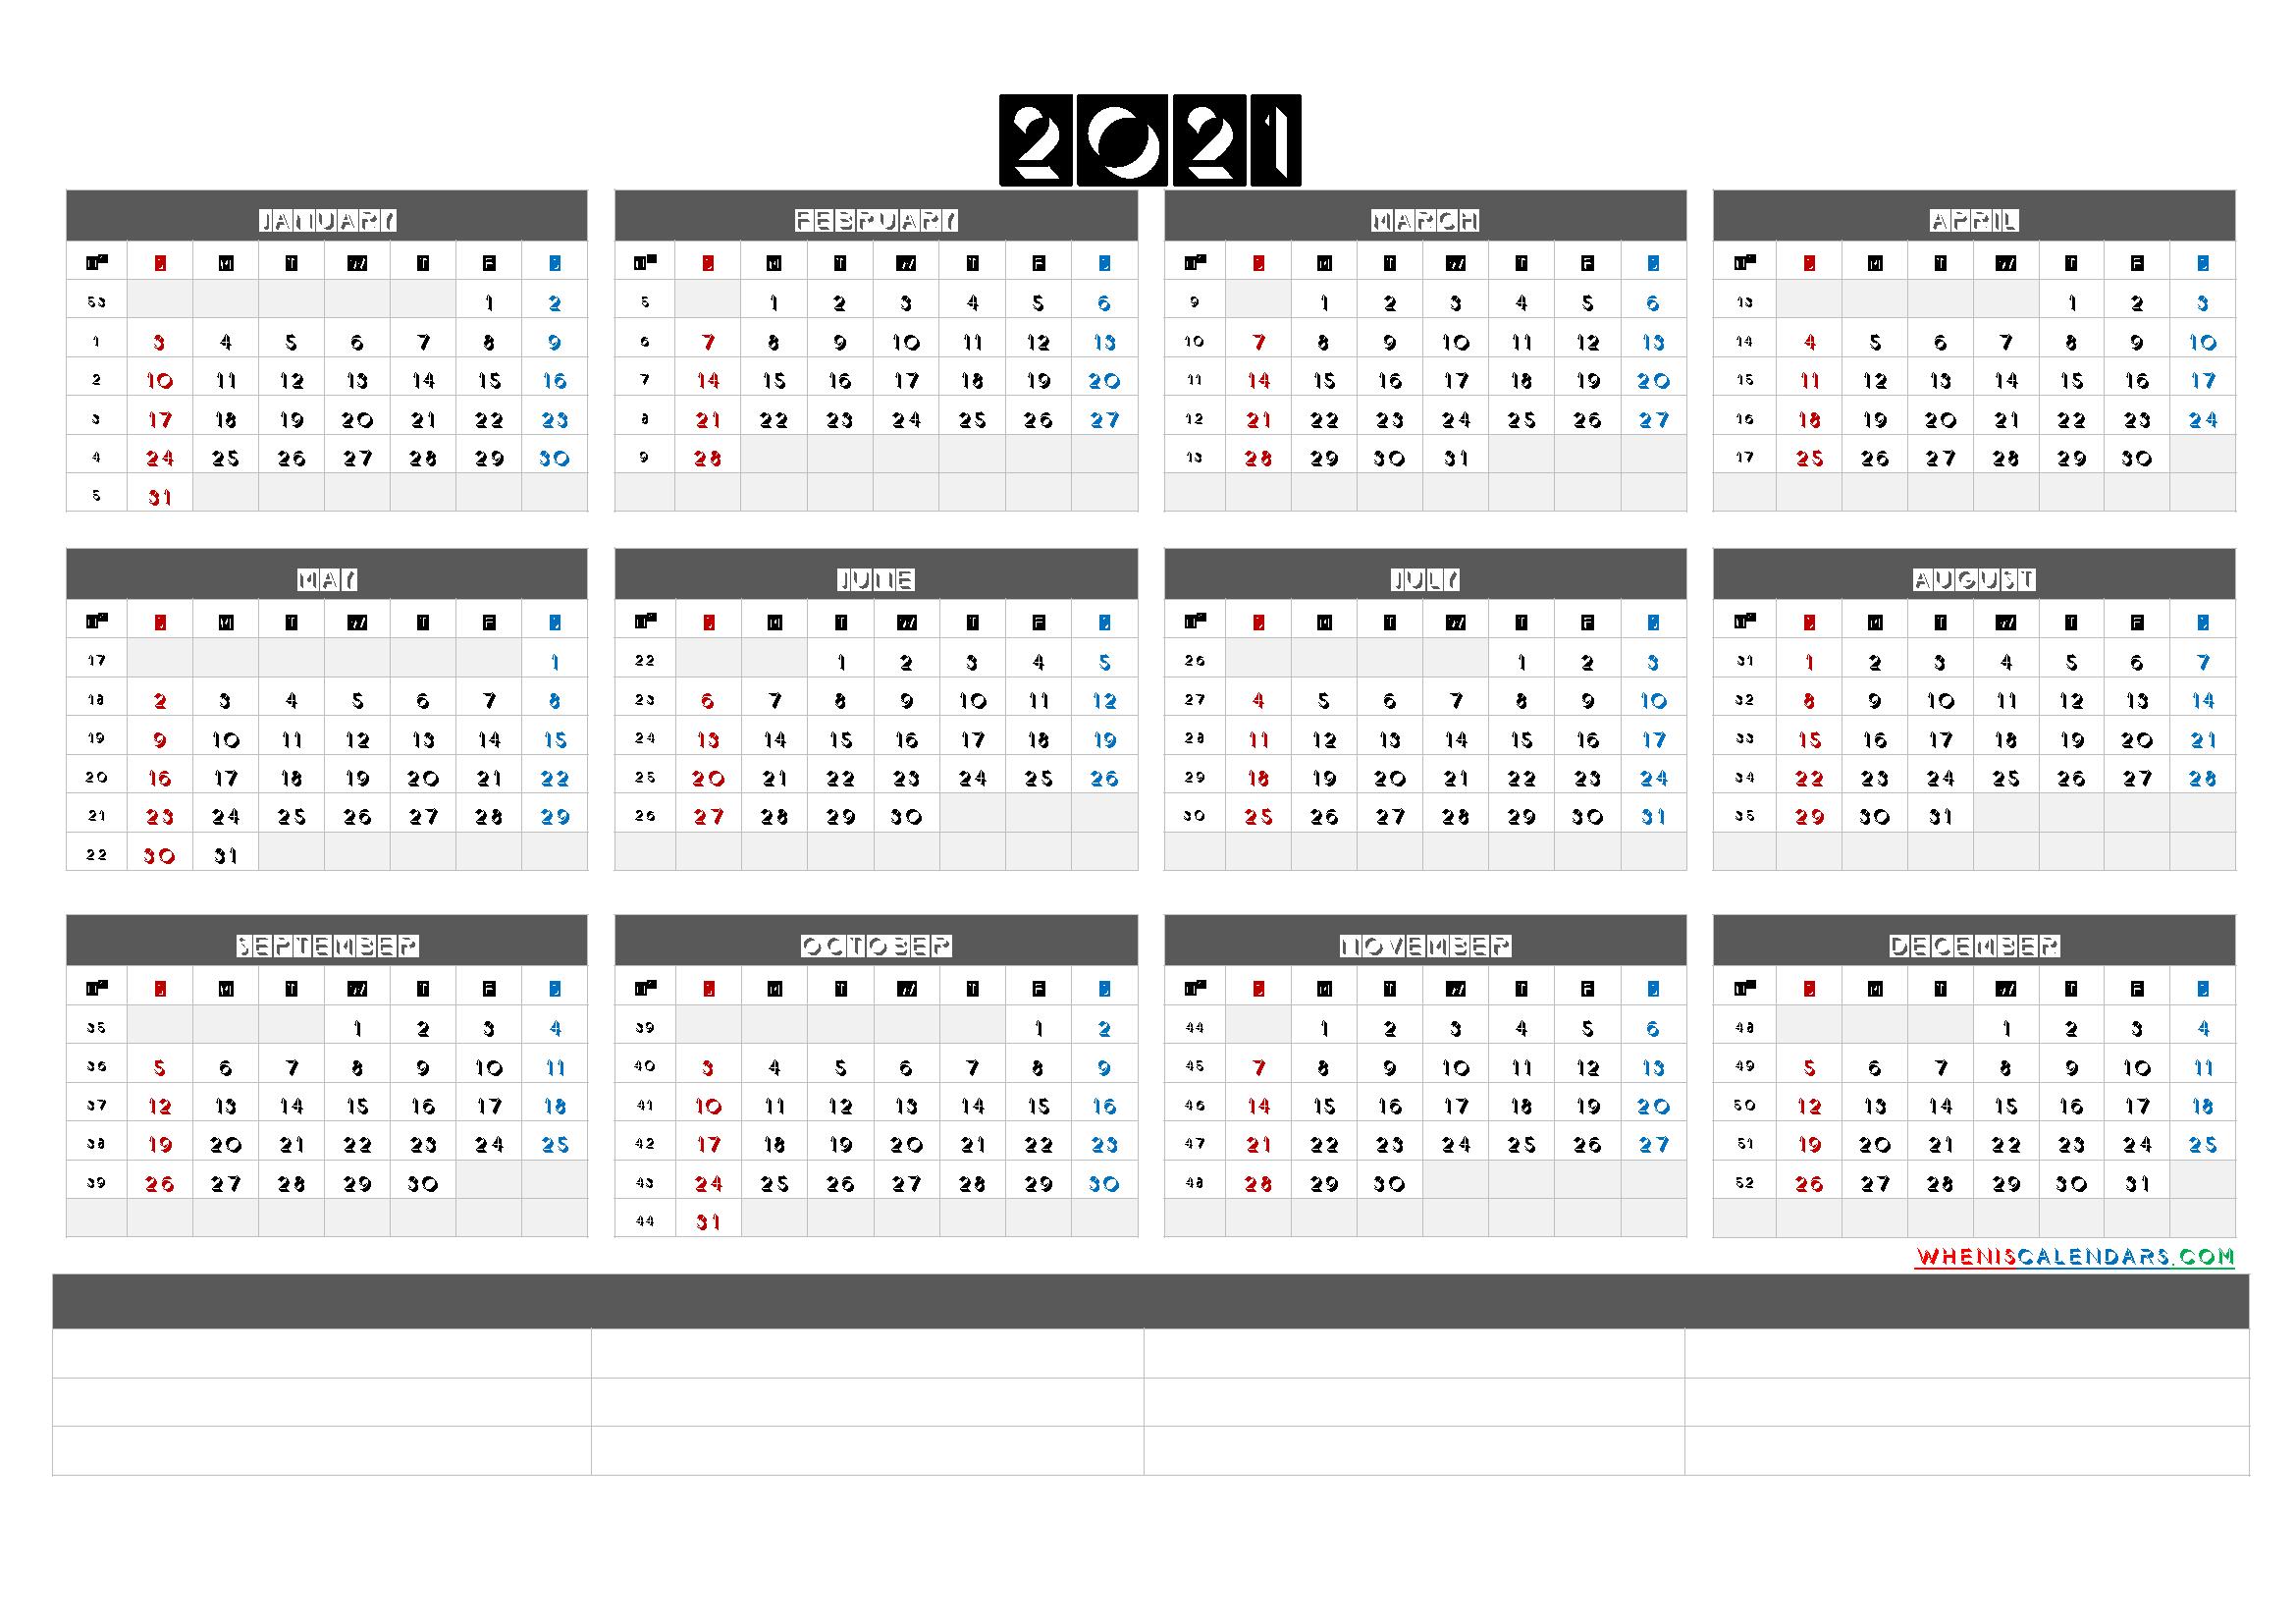 Free Printable 2021 Yearly Calendar With Week Numbers 6